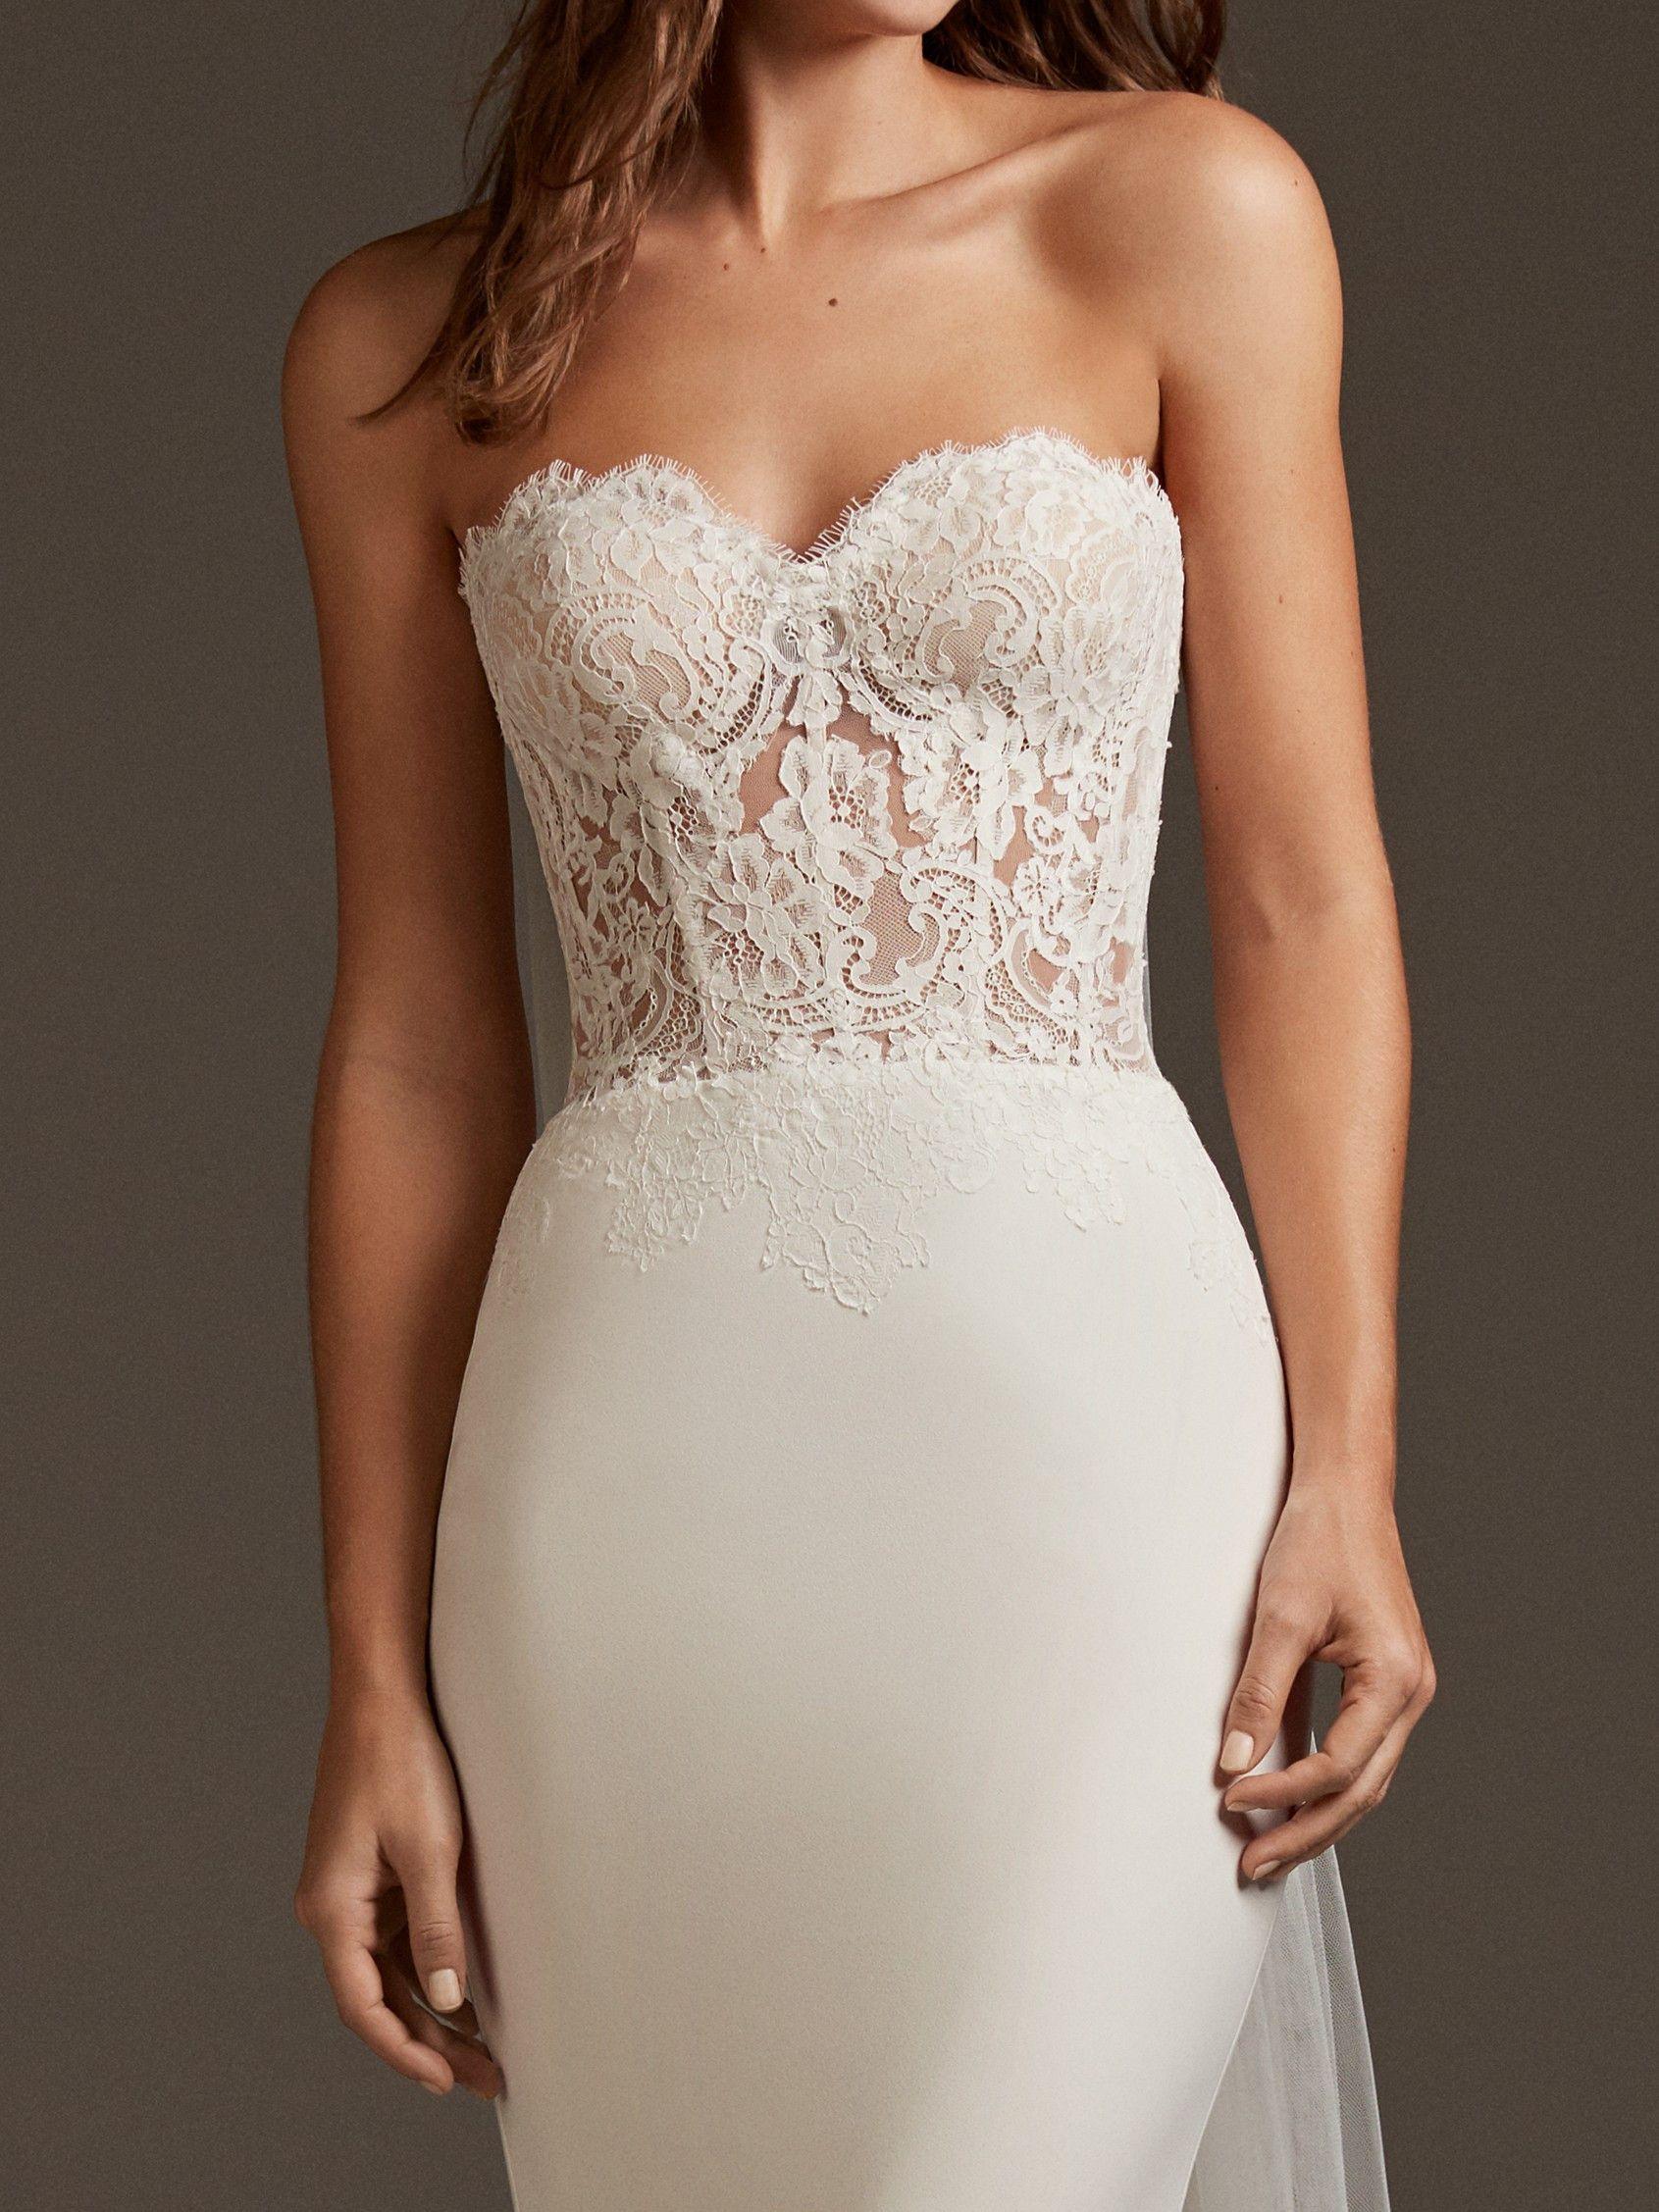 Vela Pronovias Vestidos De Novia Wedding Dresses Strapless Lace Wedding Dress Corset Mermaid Wedding Dress [ 2255 x 1691 Pixel ]